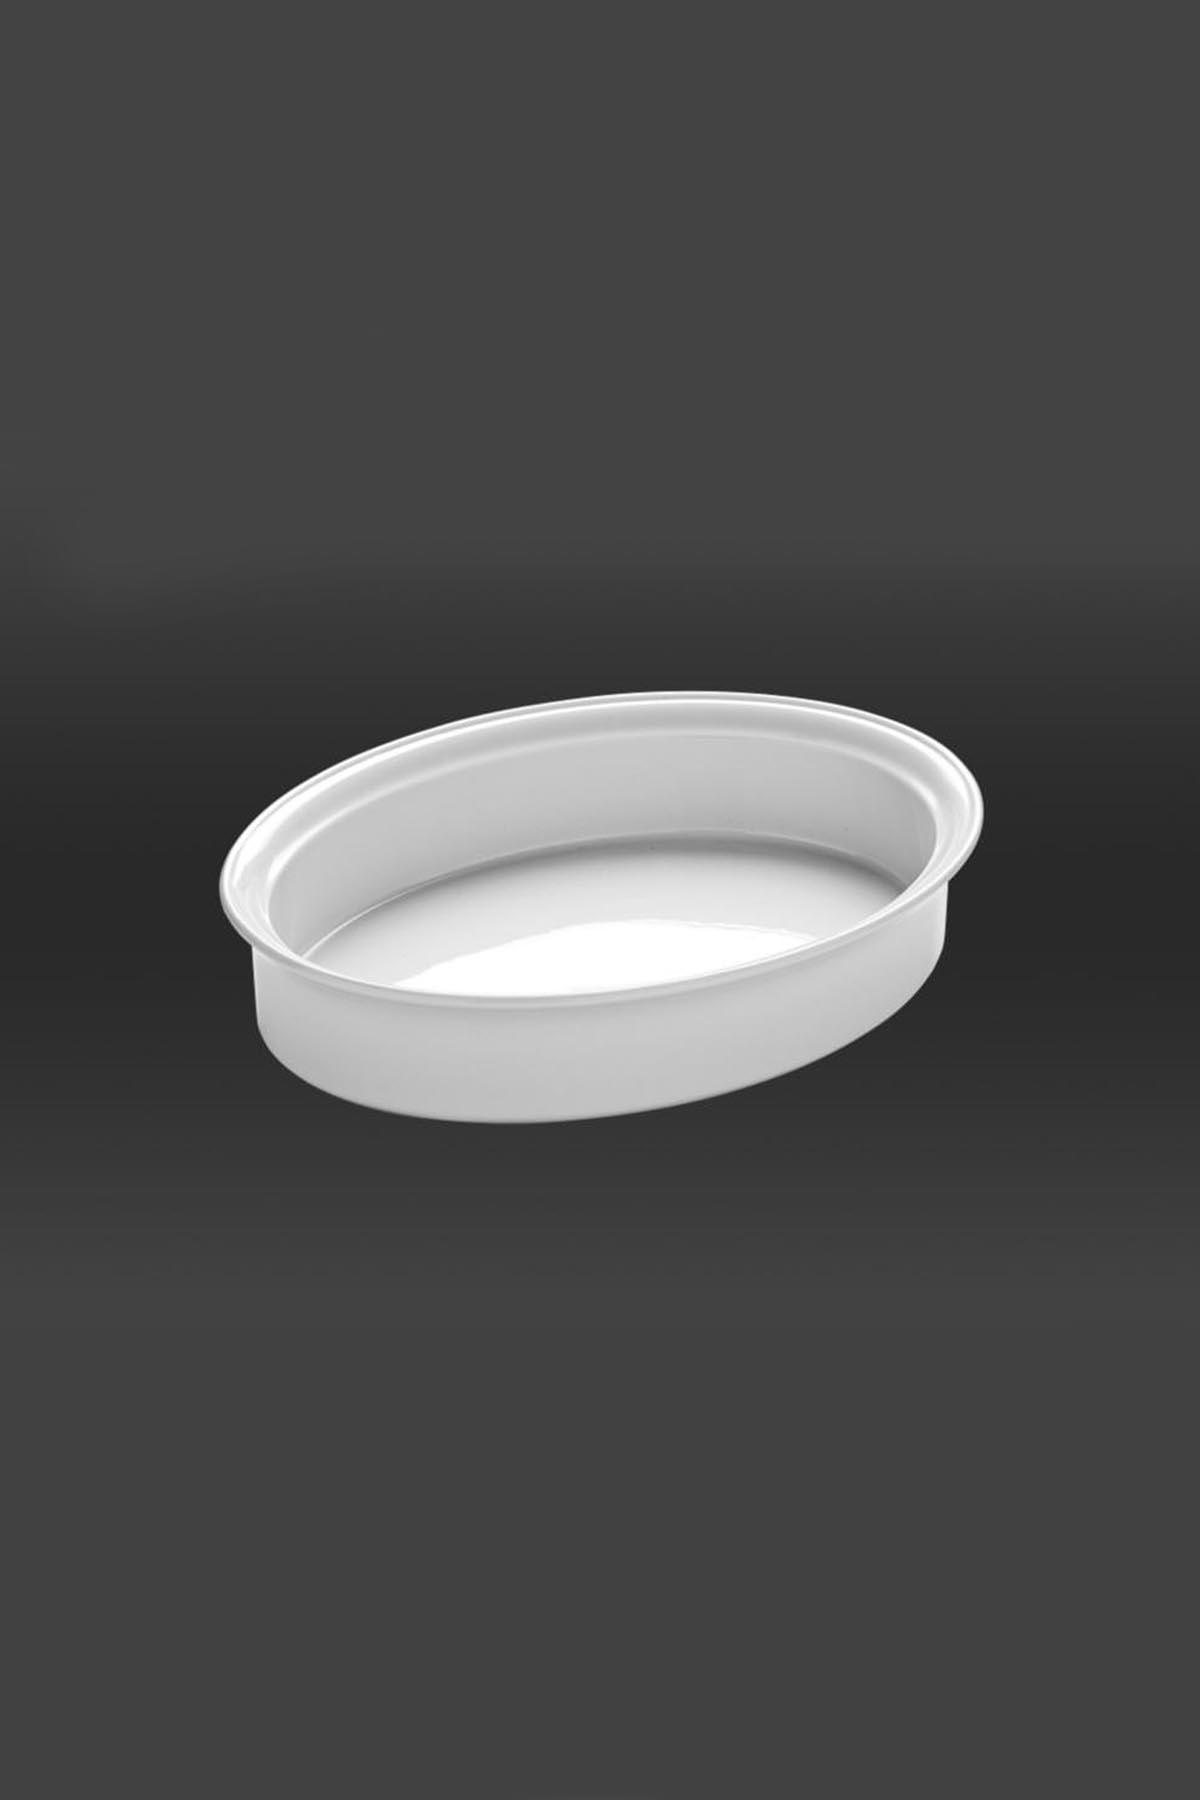 Kütahya Porselen Tavola 28 cm Firin Kabi Oval